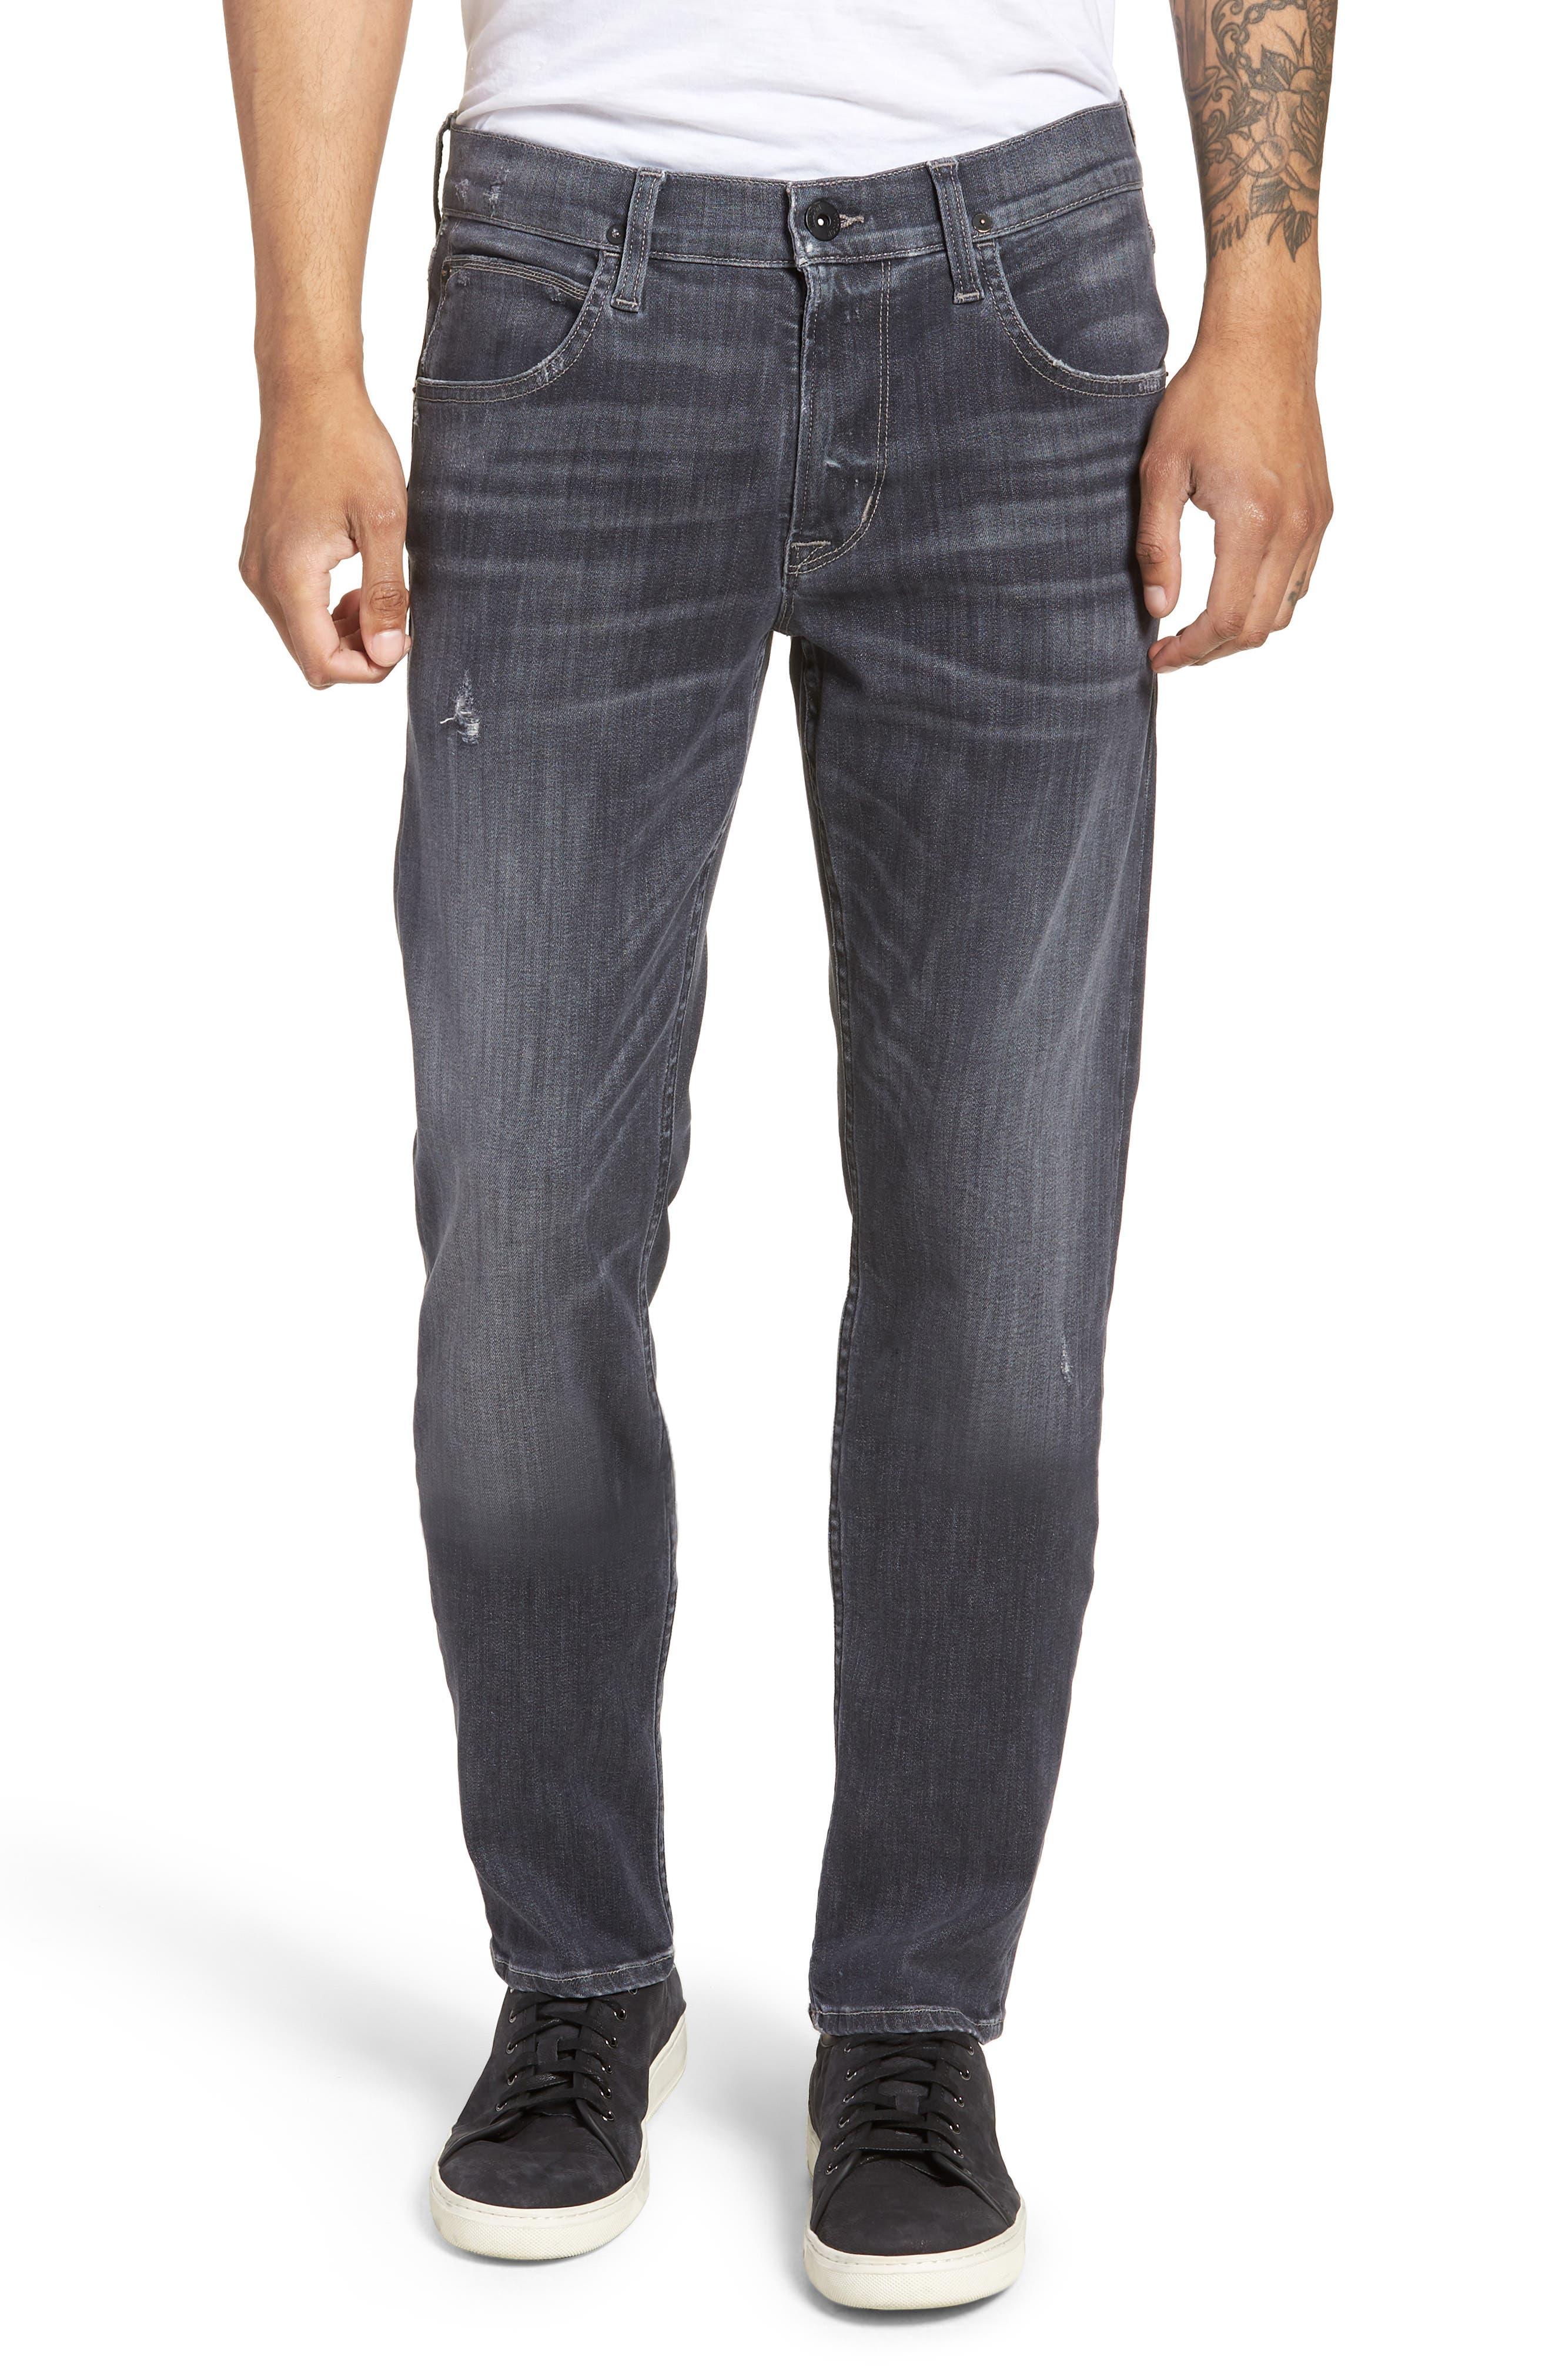 Blake Slim Fit Jeans,                             Main thumbnail 1, color,                             Silver Lake